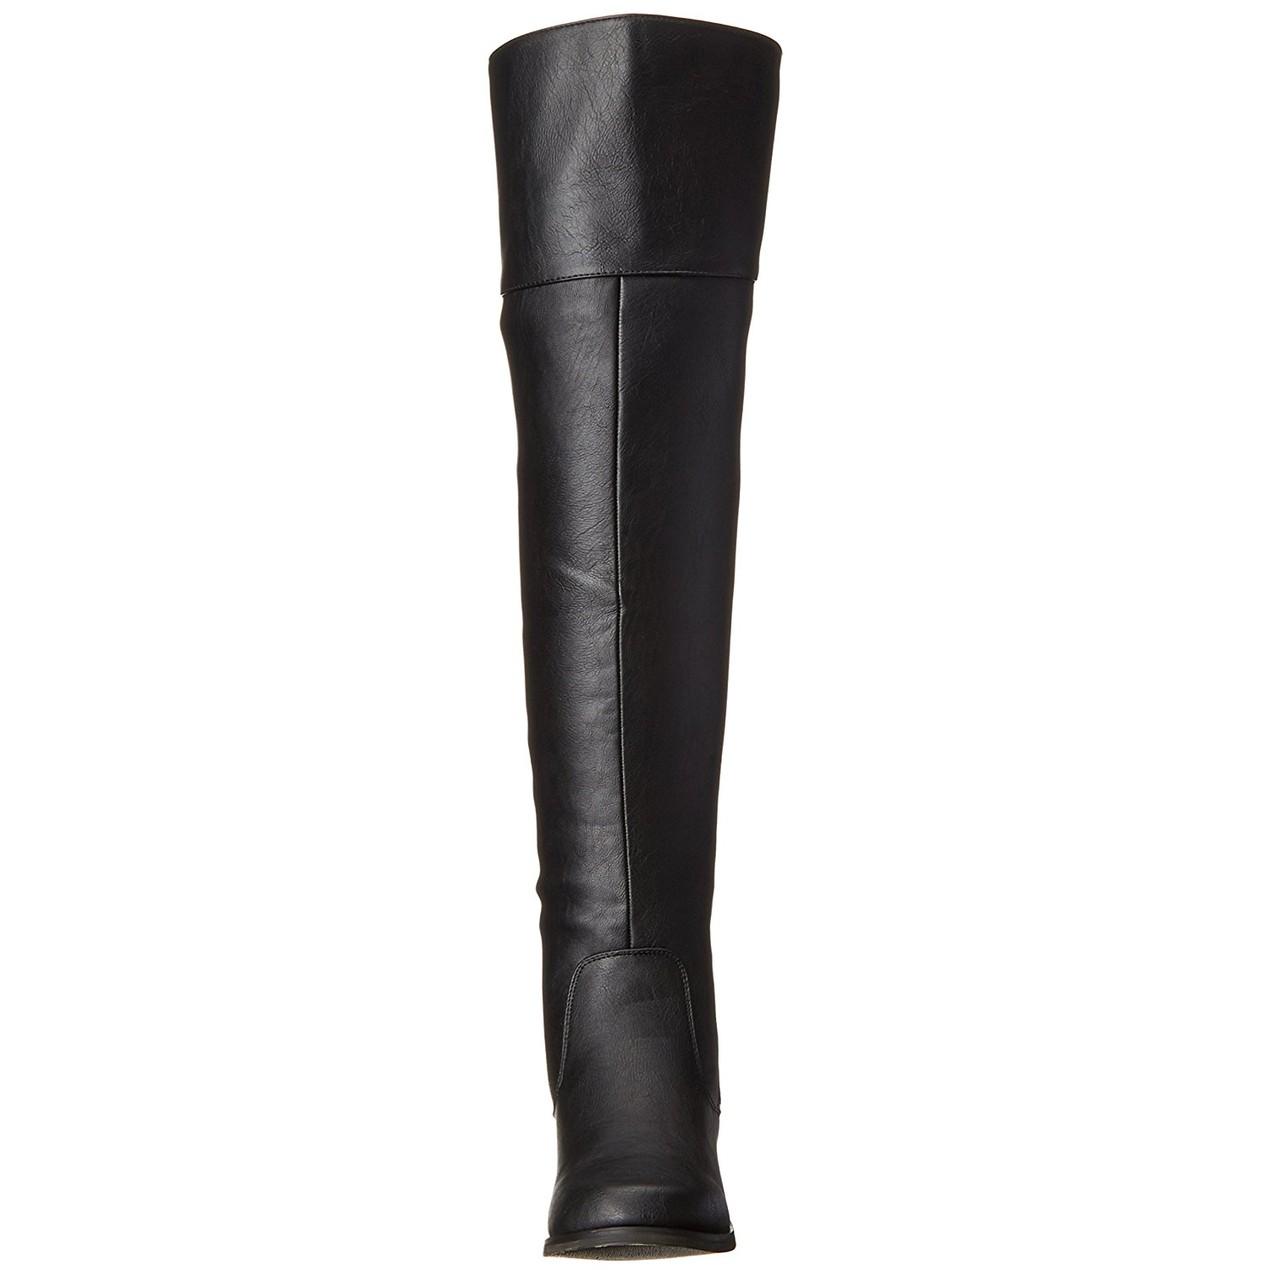 35c871f5c82 XOXO Womens Bardot Almond Toe Over Knee Fashion Boots - Tanga